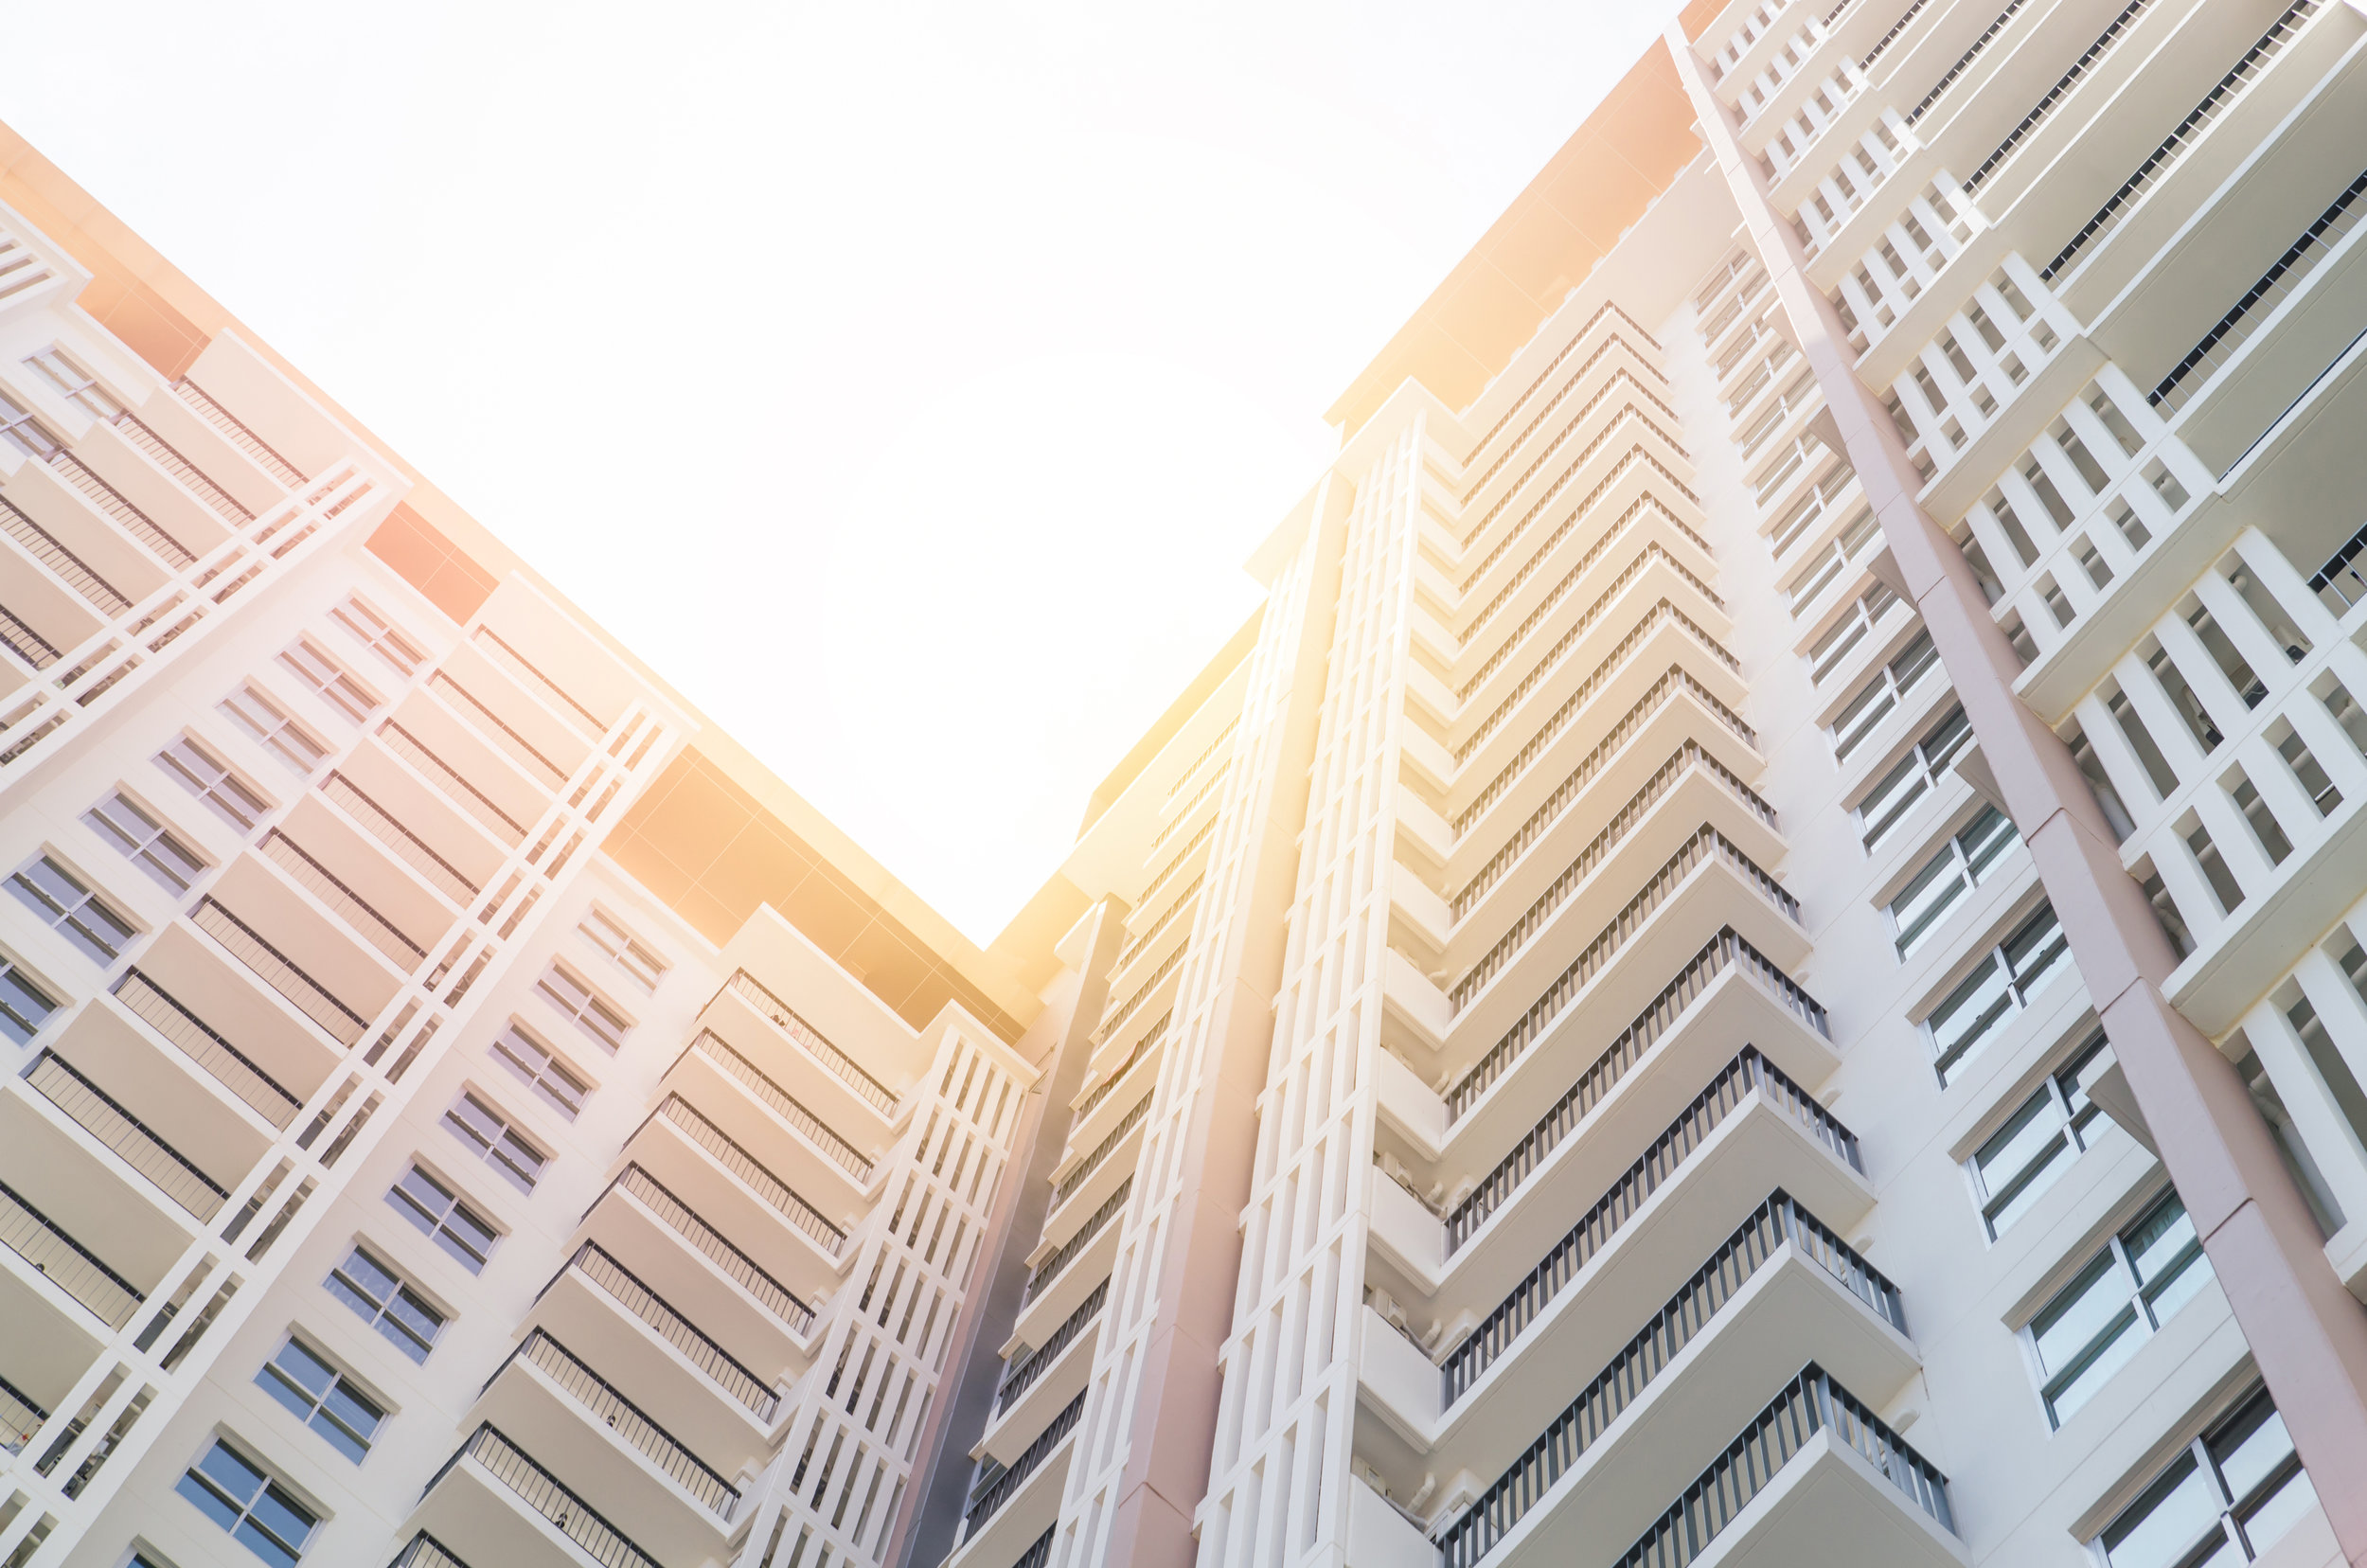 stock-photo-apartment-building-vintage-tone-524241556.jpg